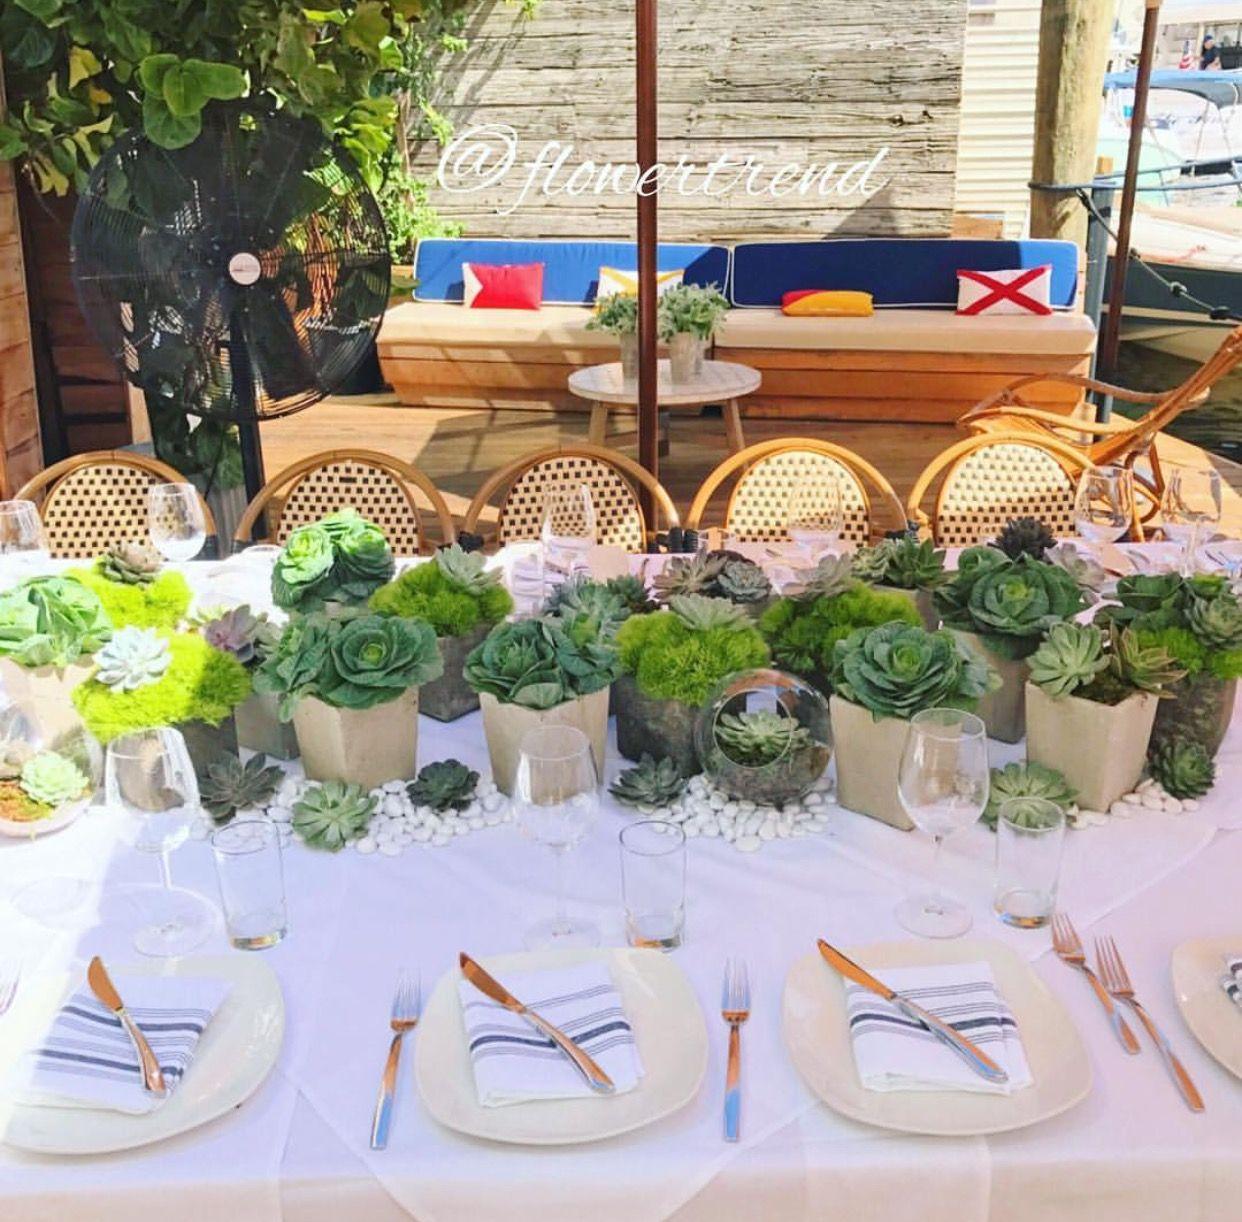 Succulent wedding table centerpieces Succulent wedding